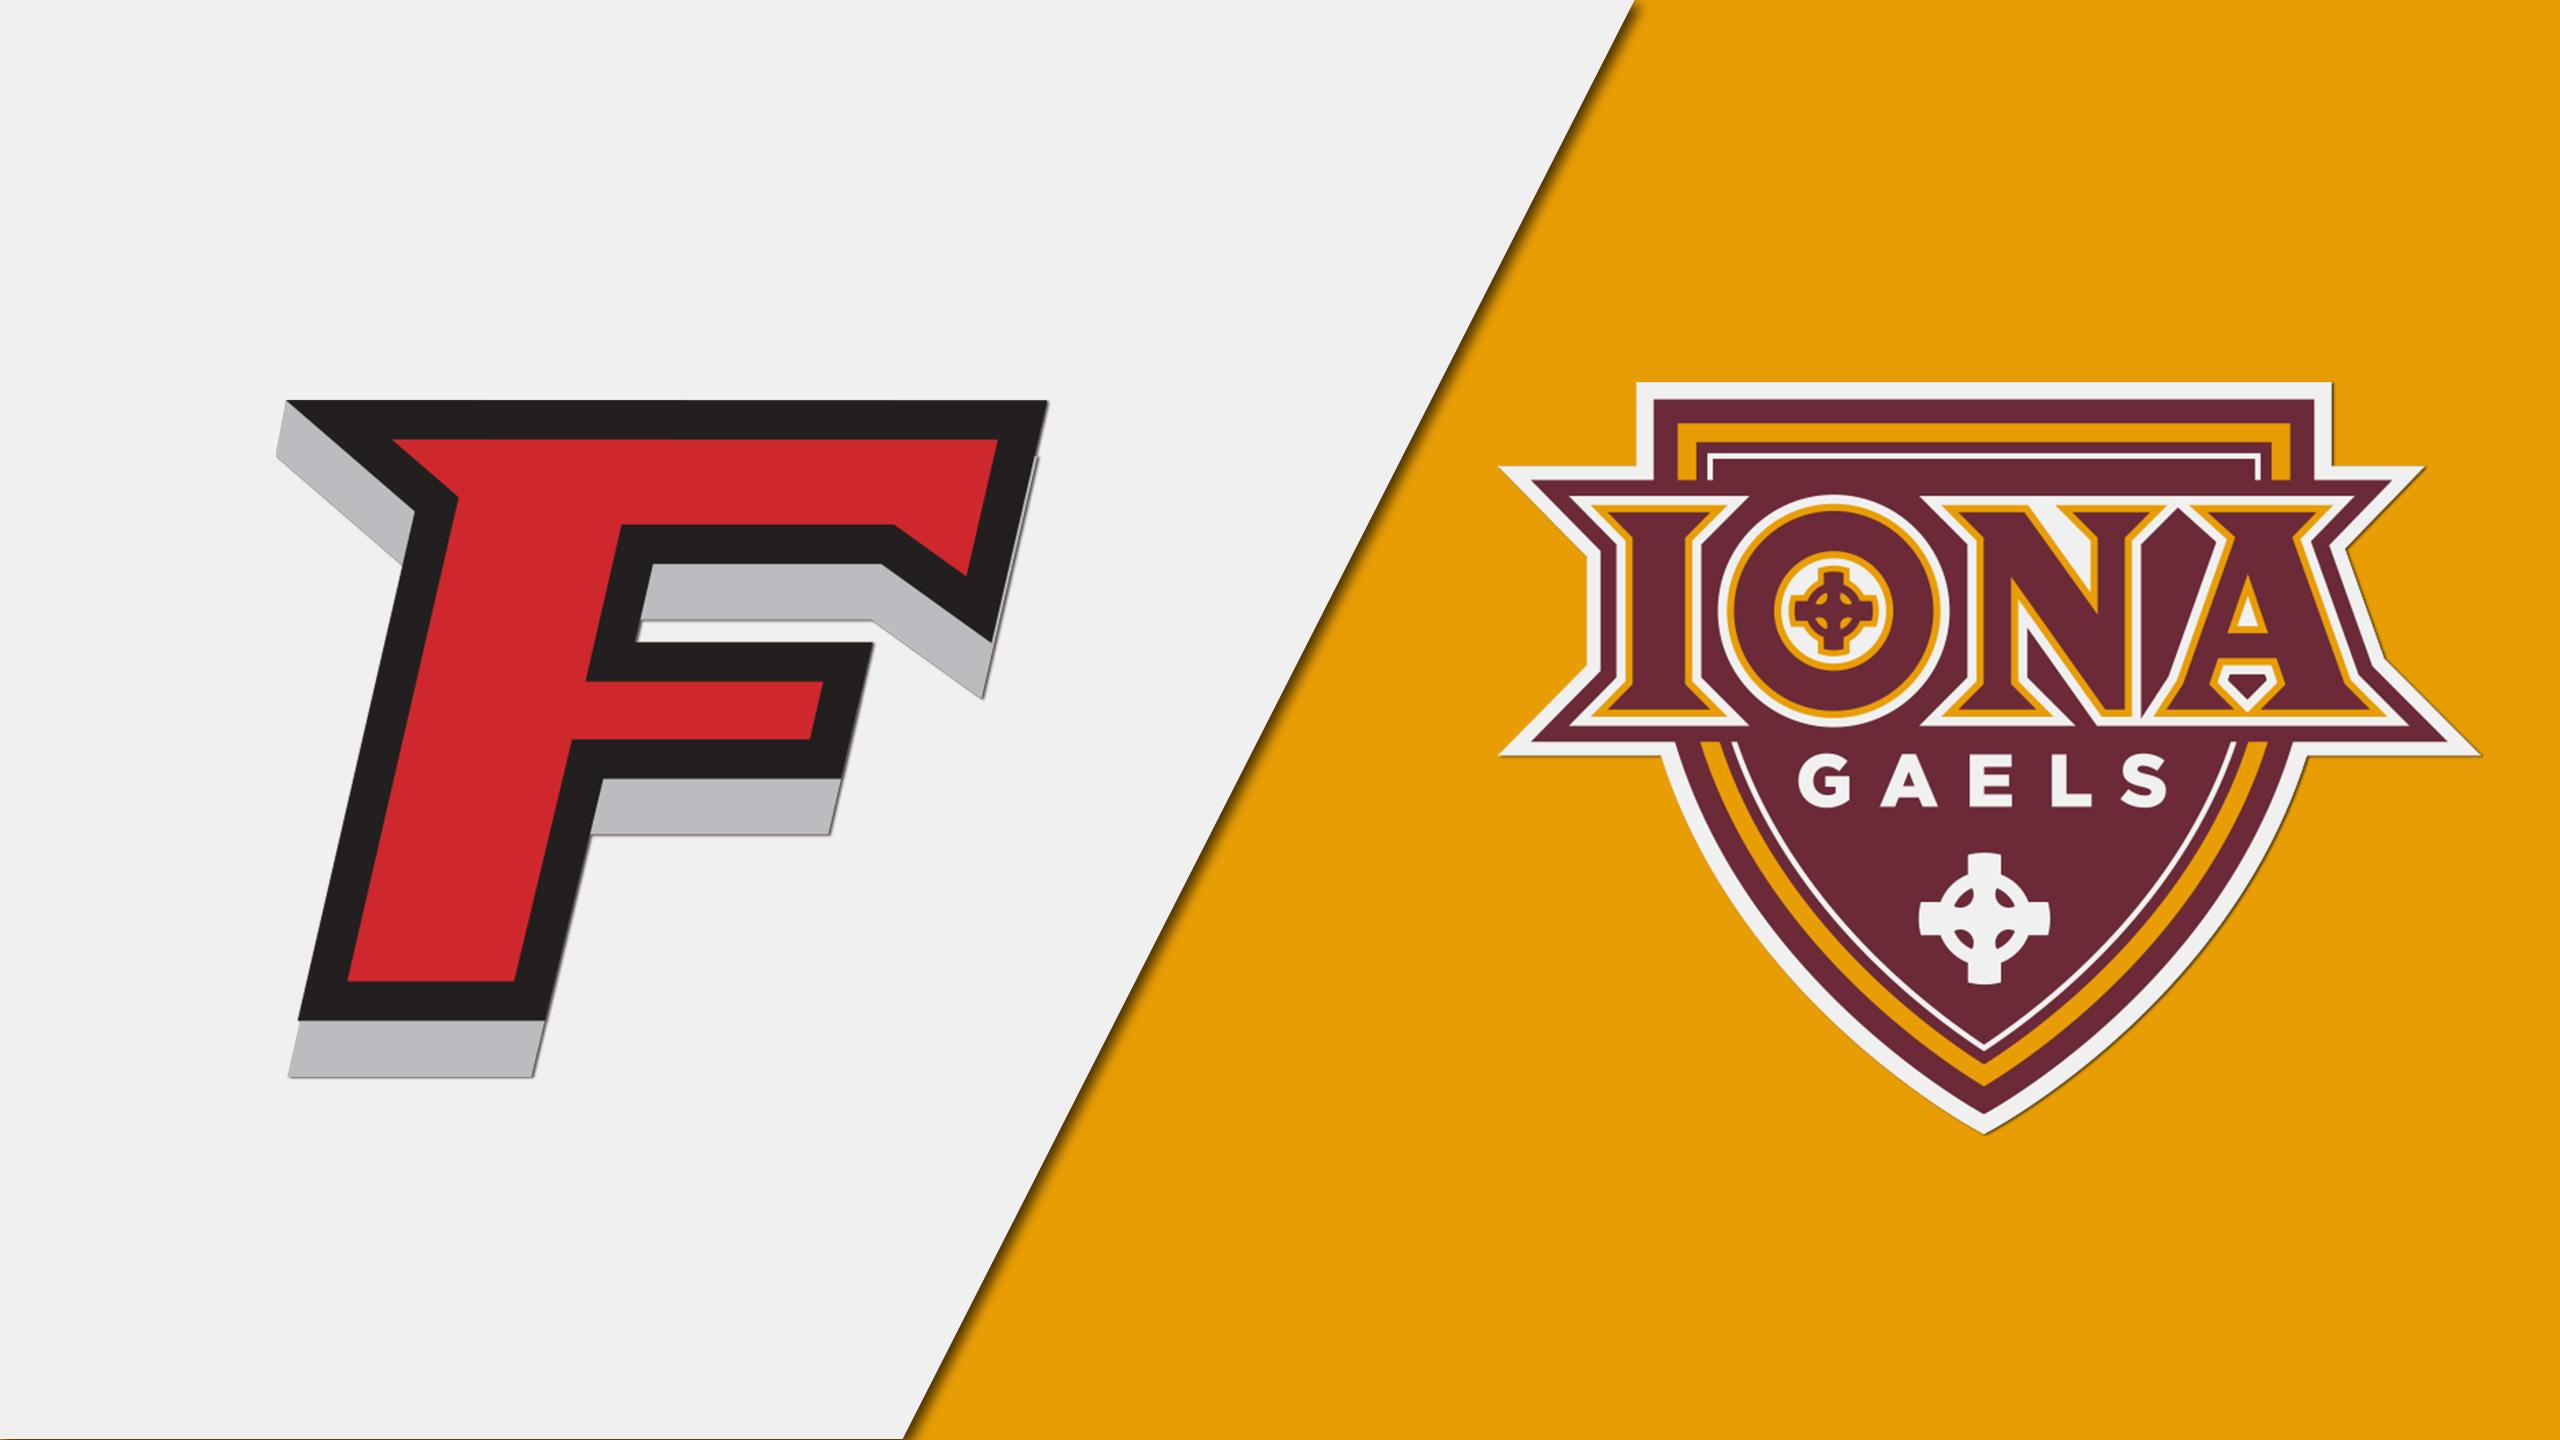 Fairfield vs. Iona